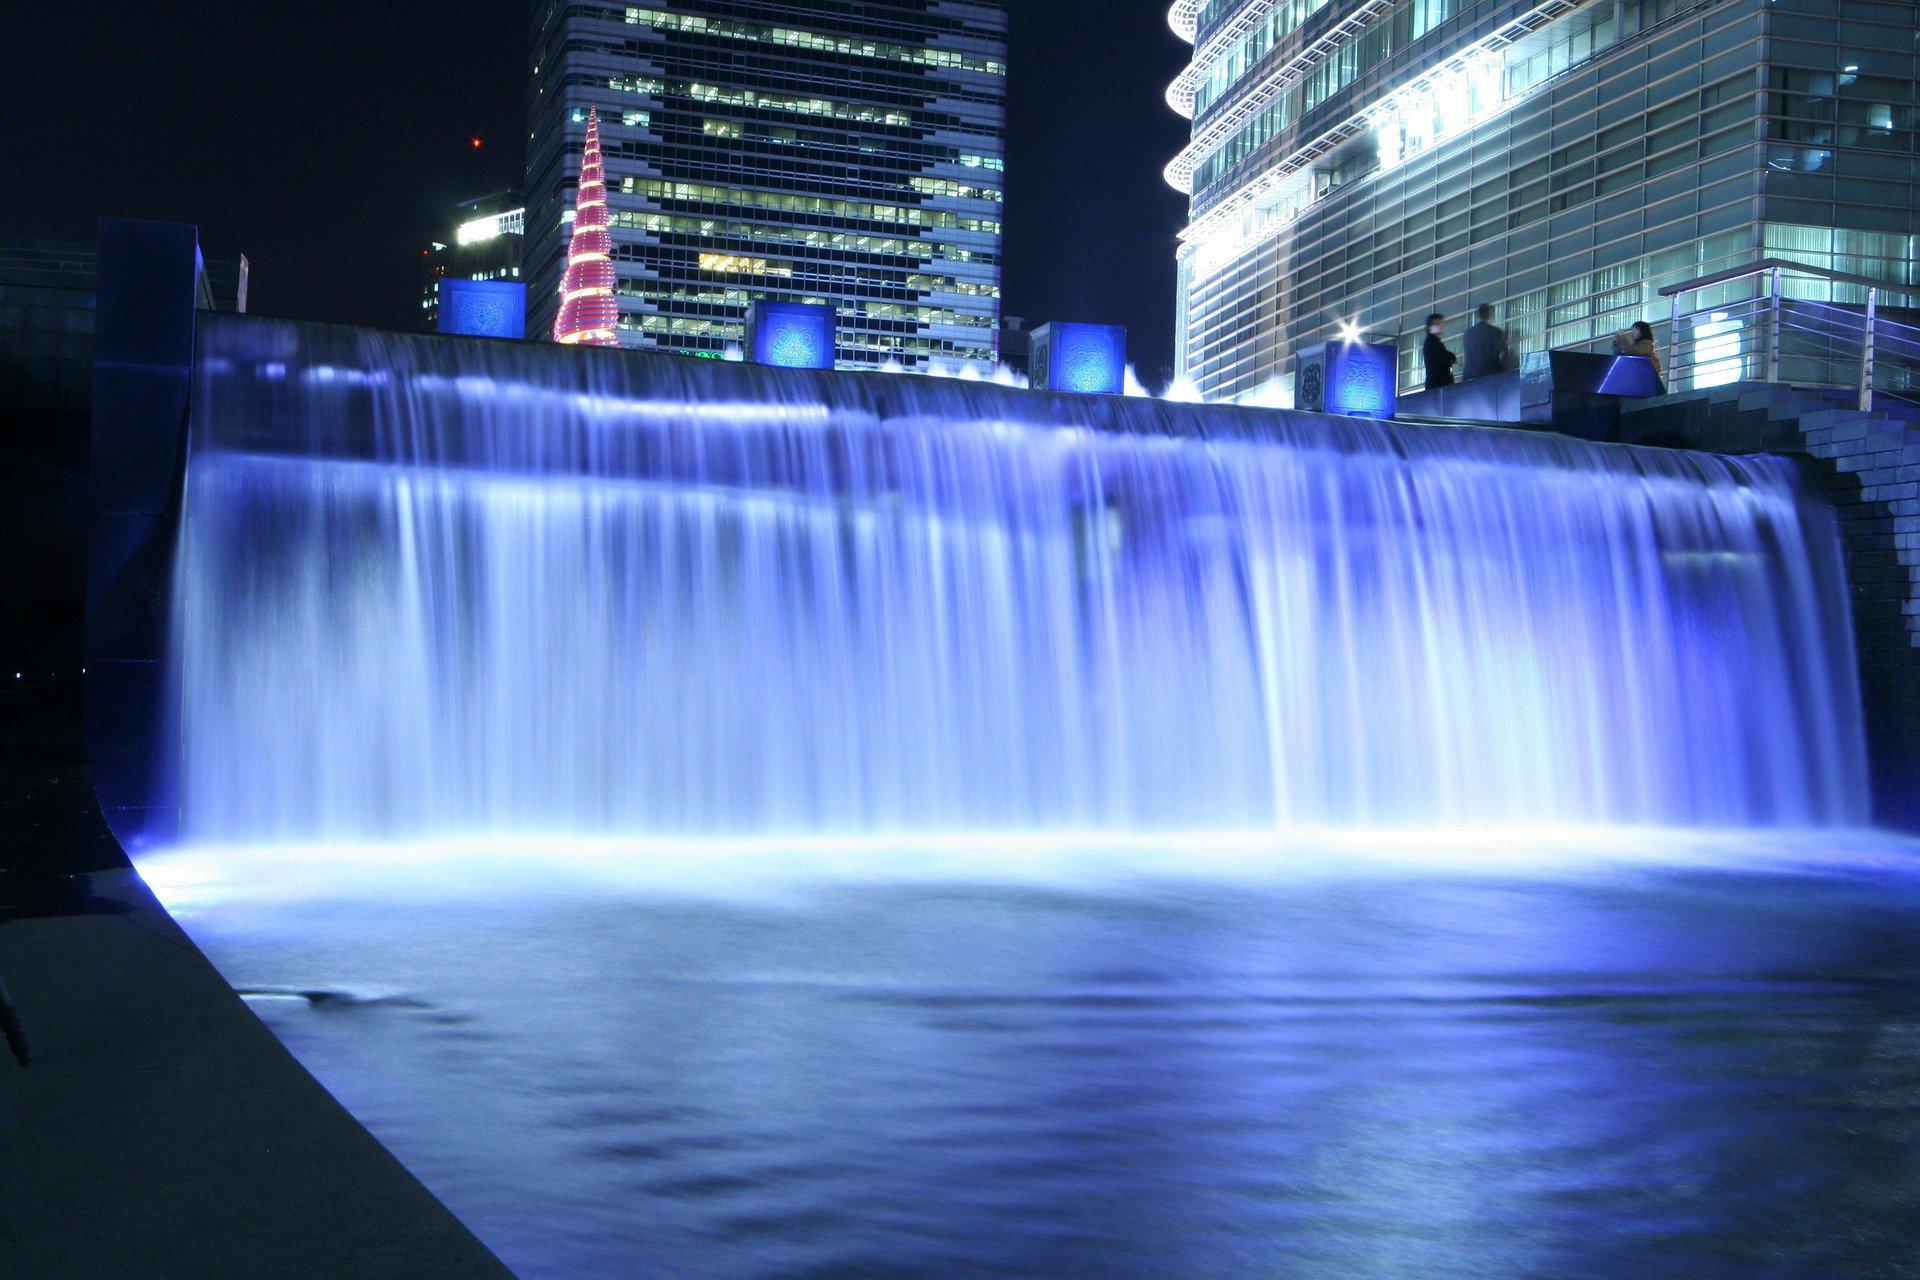 Seoul waterfall